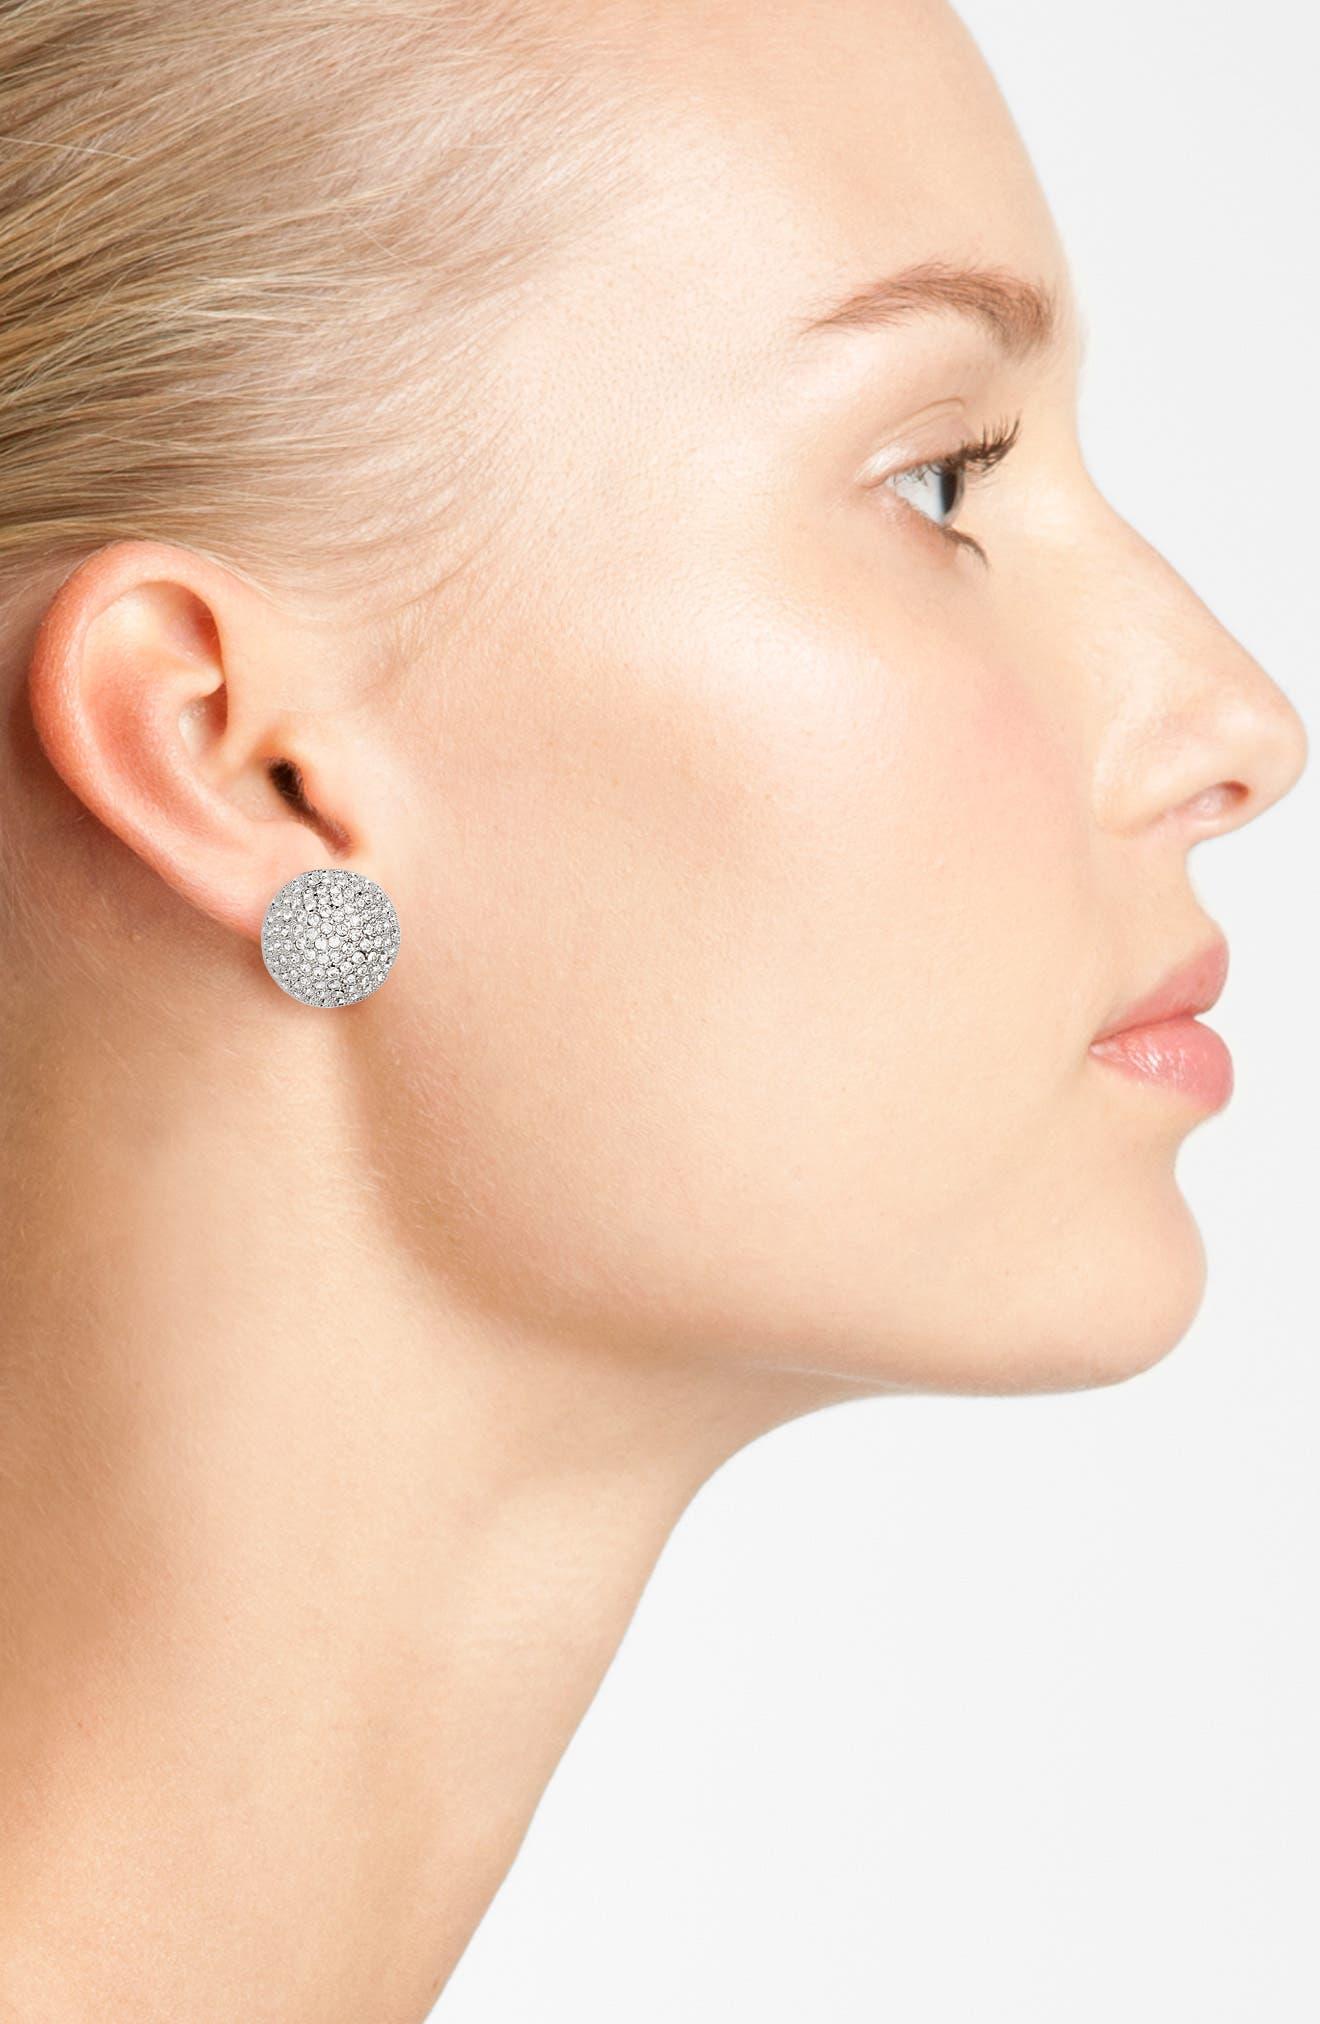 Clip Swarovski Crystal Earrings,                             Alternate thumbnail 2, color,                             SILVER